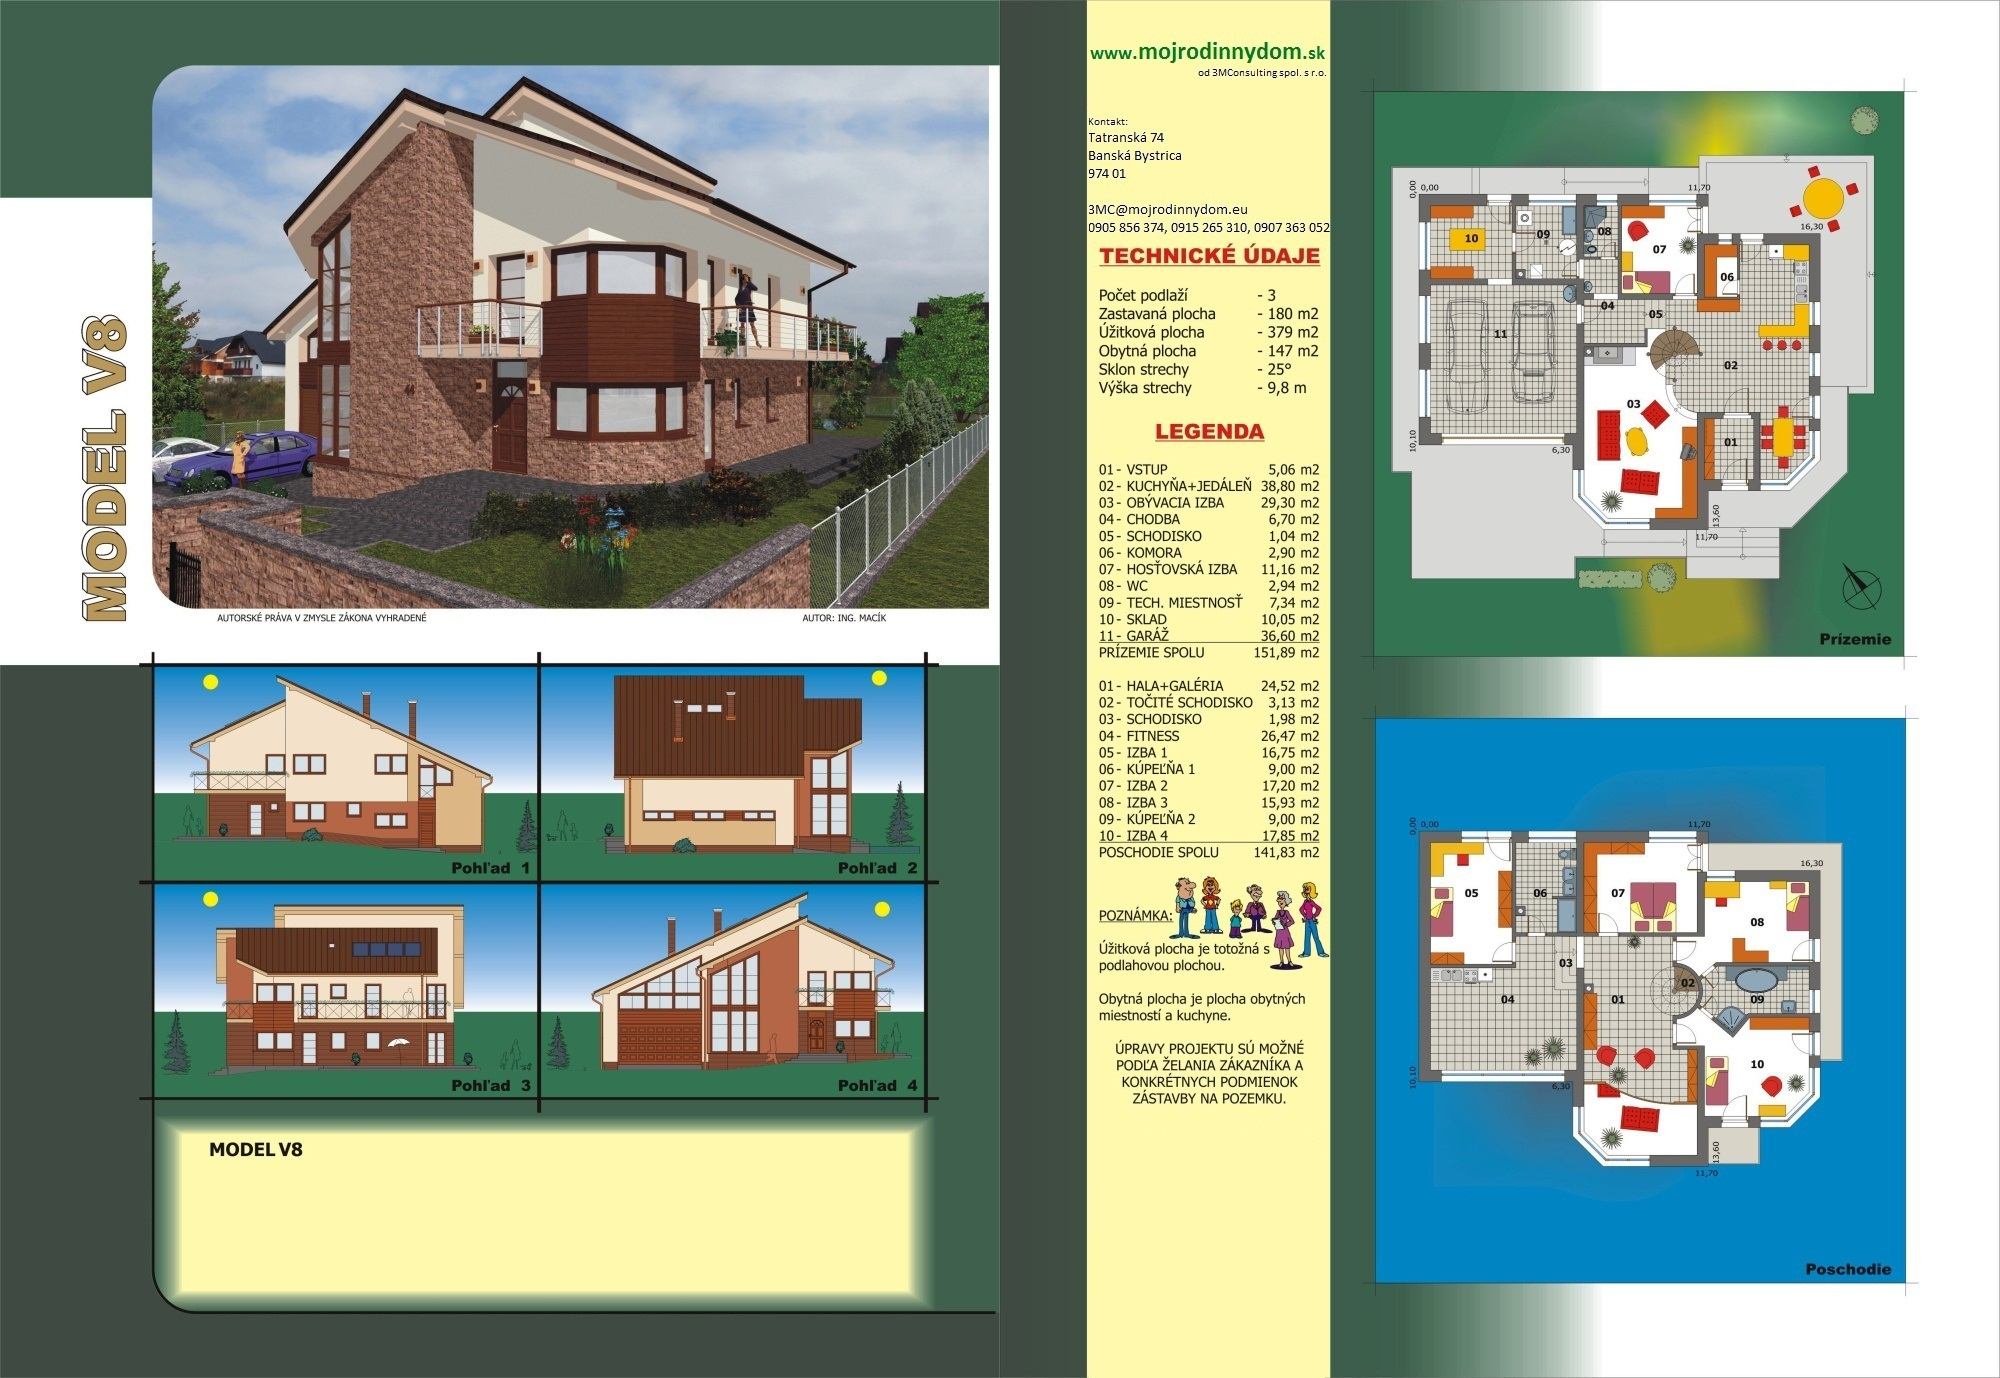 projekt veľkého rodinného domu xv8